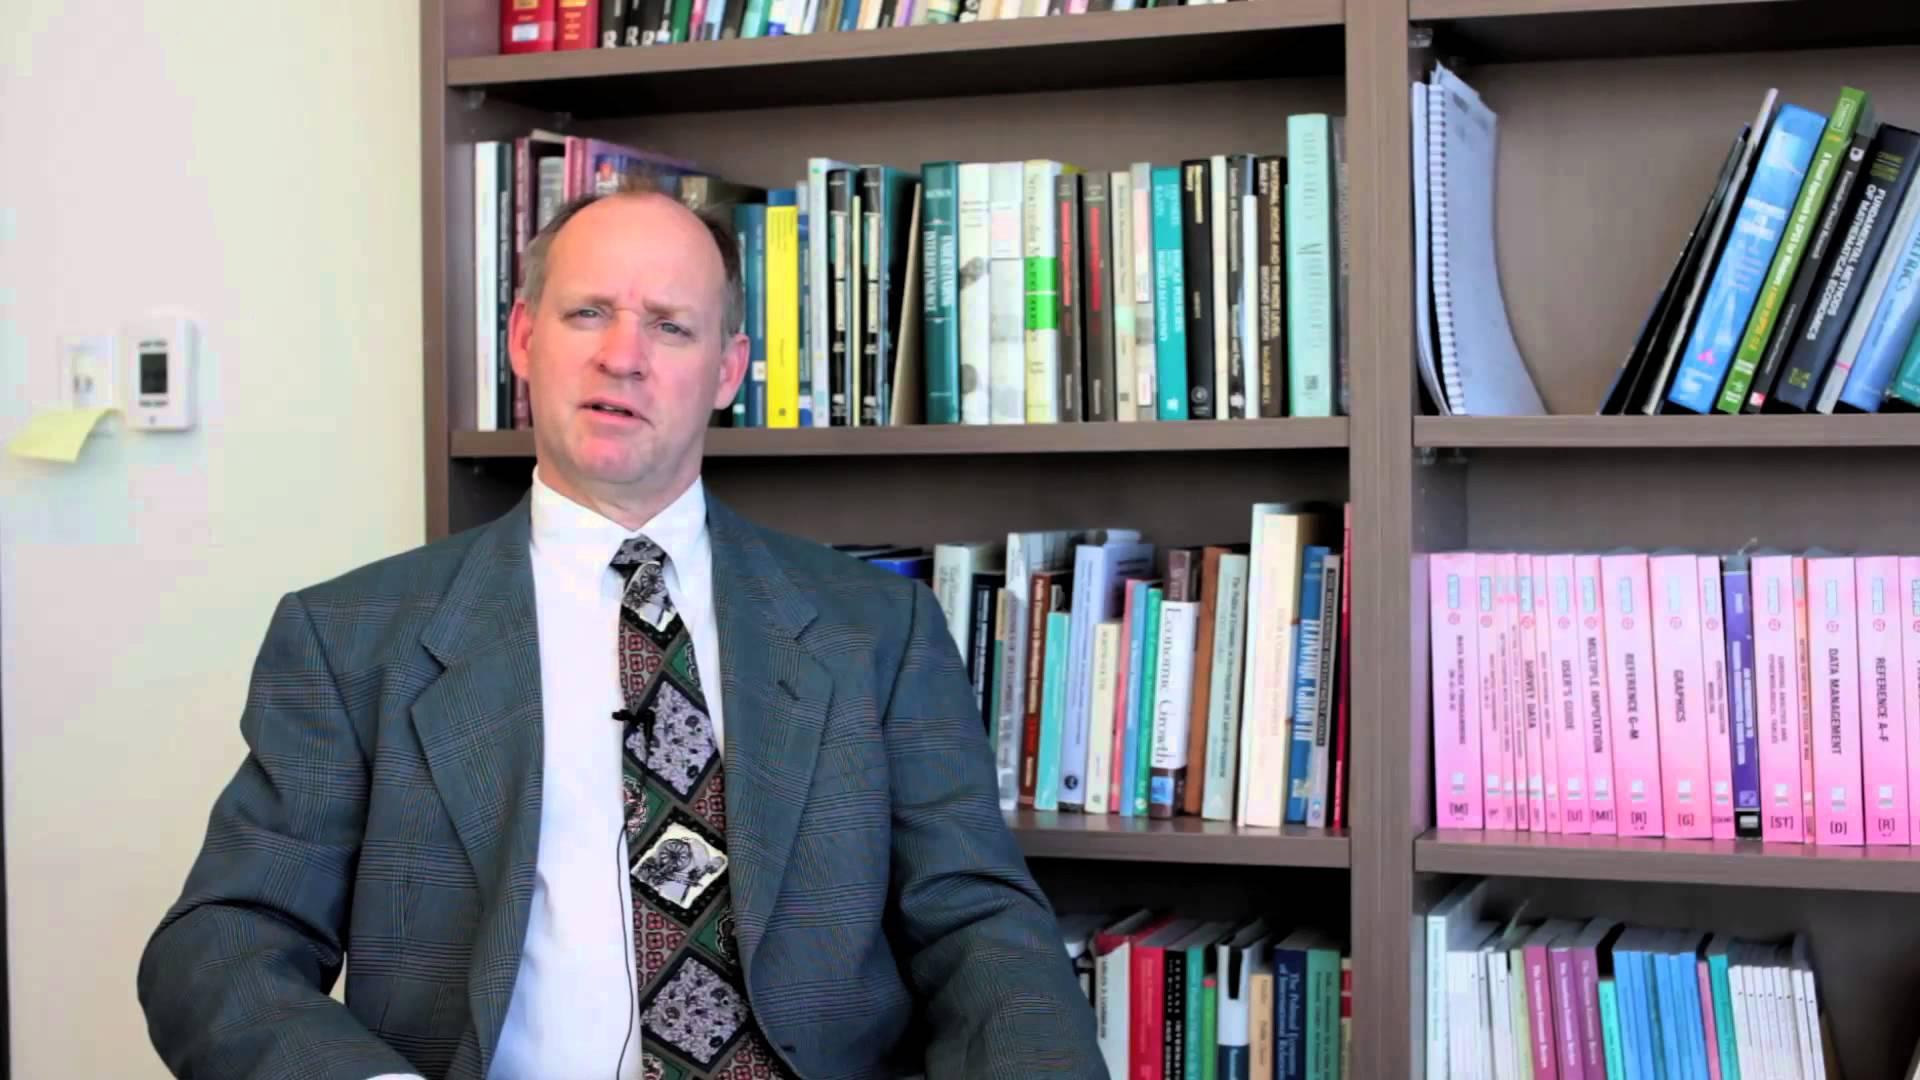 Thumbnail for: Carleton's Norman Paterson School of International Affairs (NPSIA)